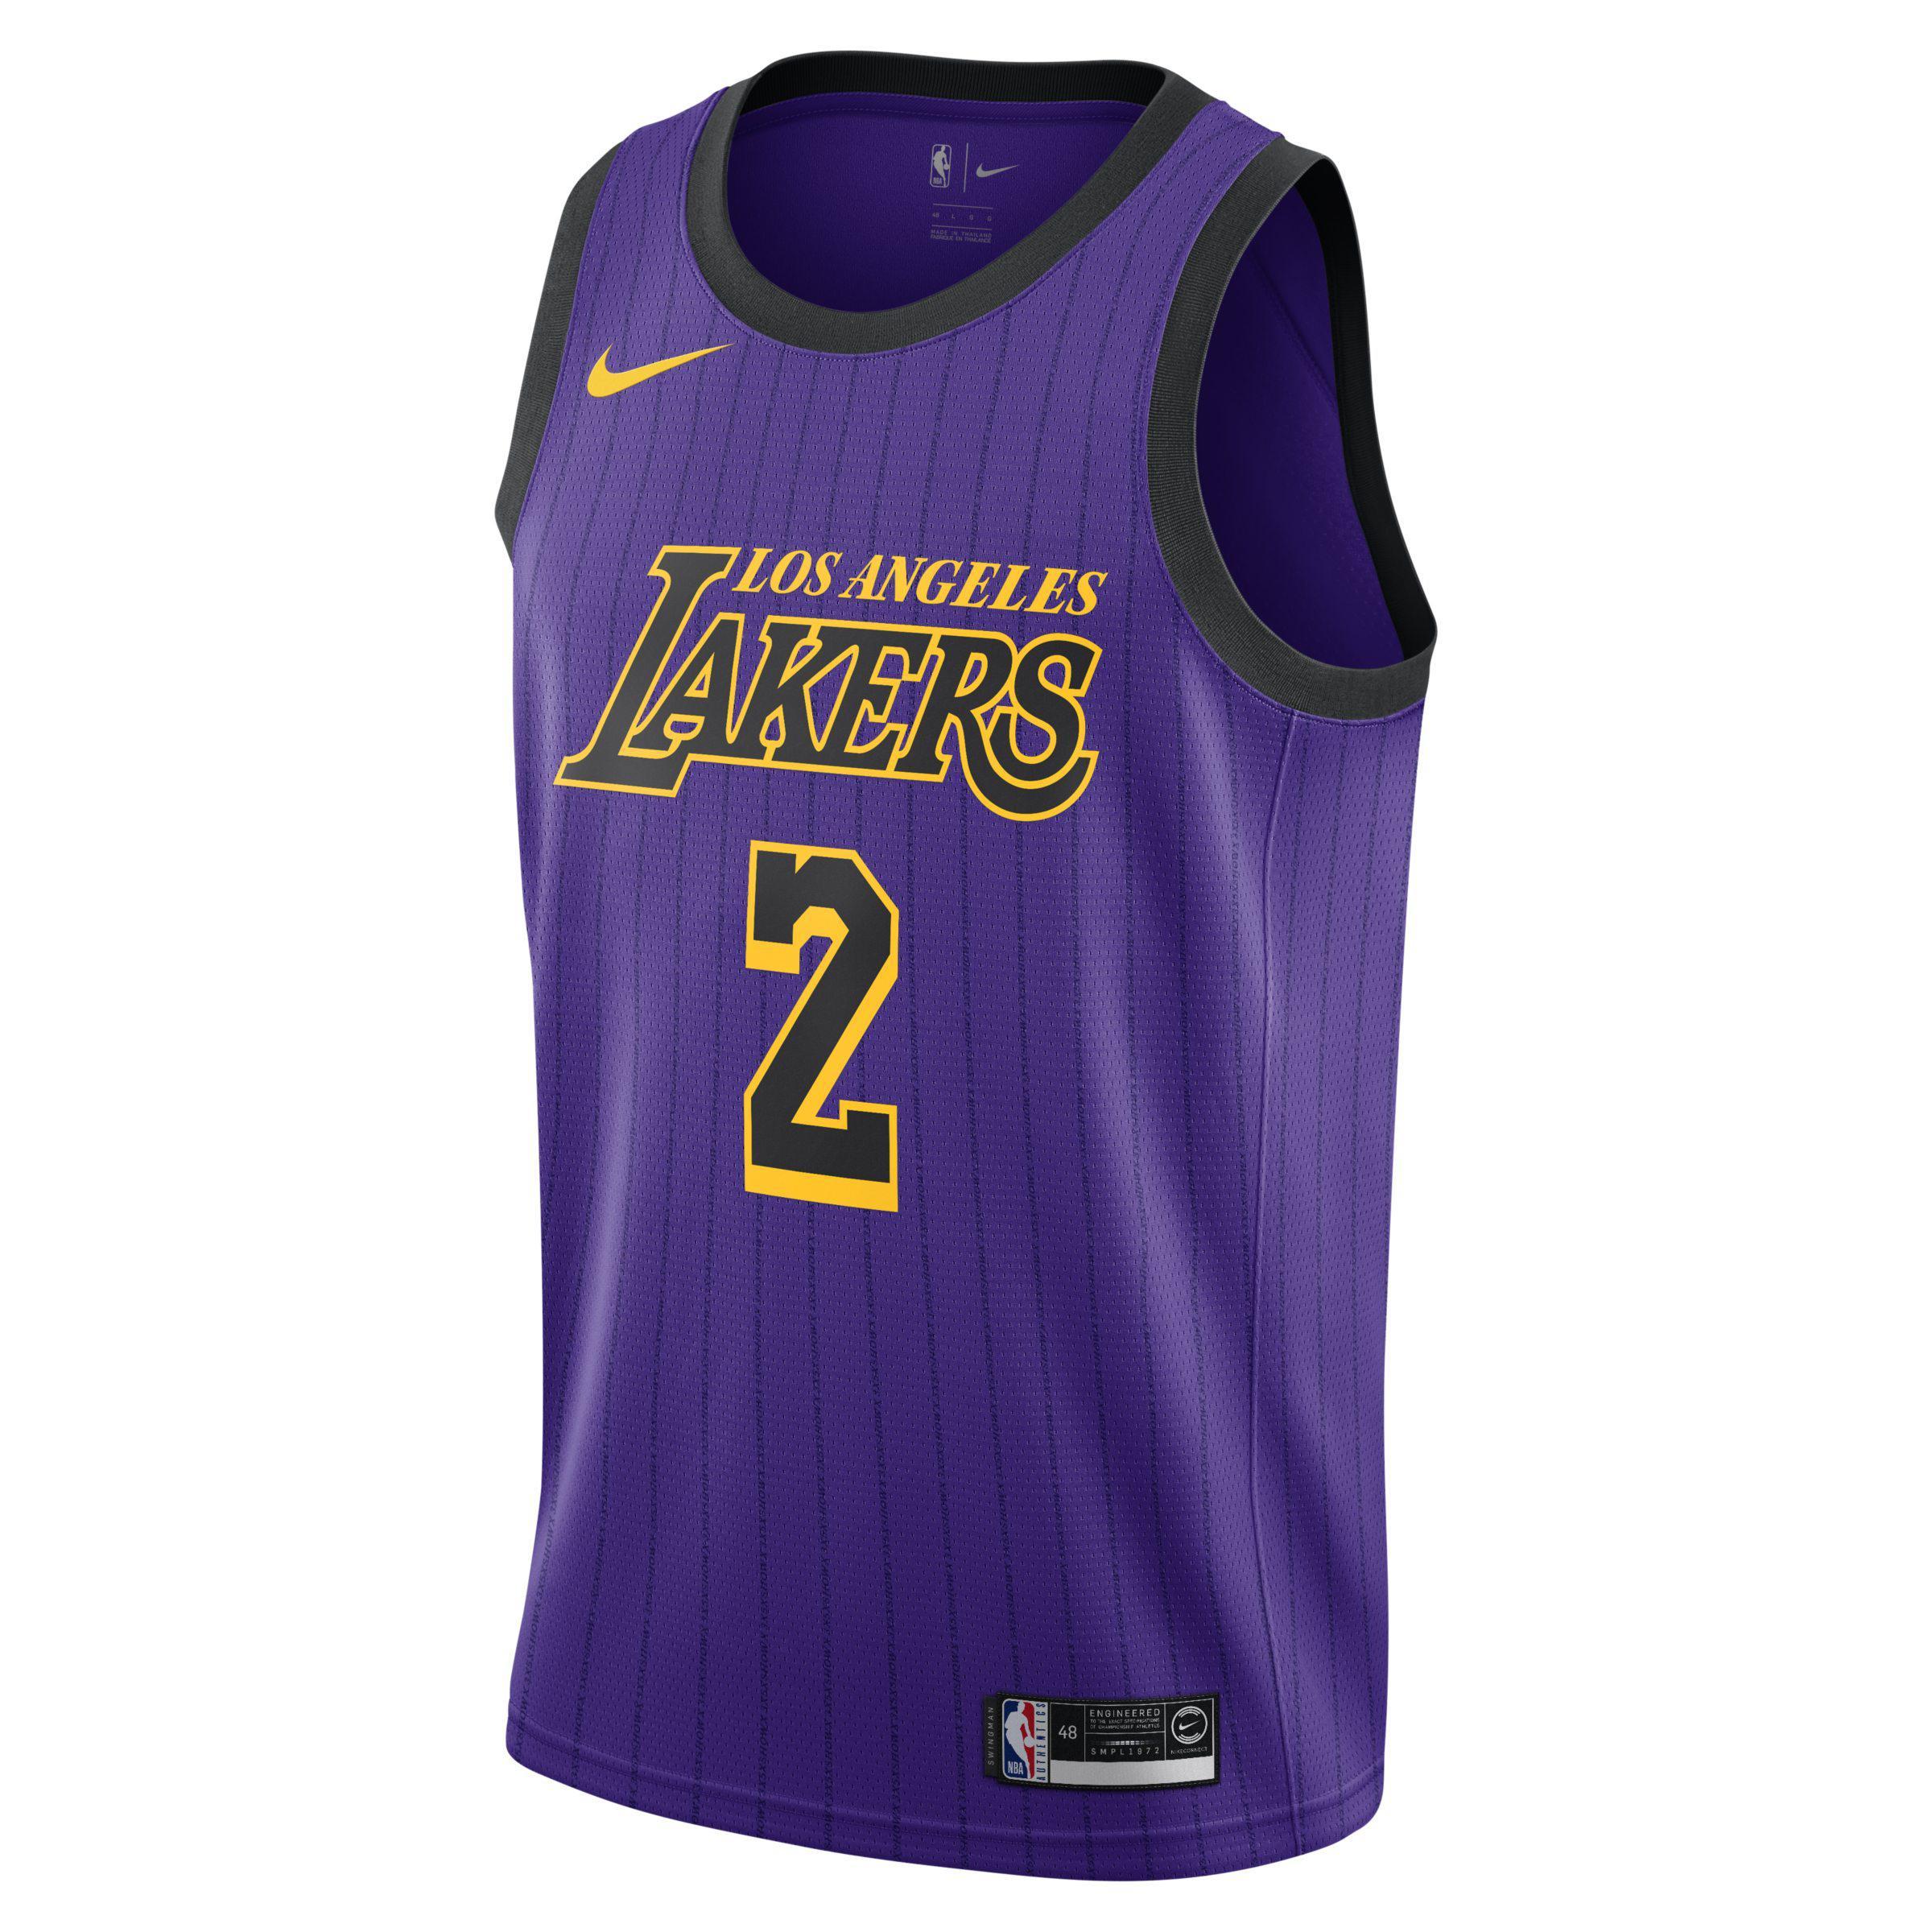 Nike. Men s Purple Lonzo Ball City Edition Swingman (los Angeles Lakers) Nba  Connected Jersey b29407cc9